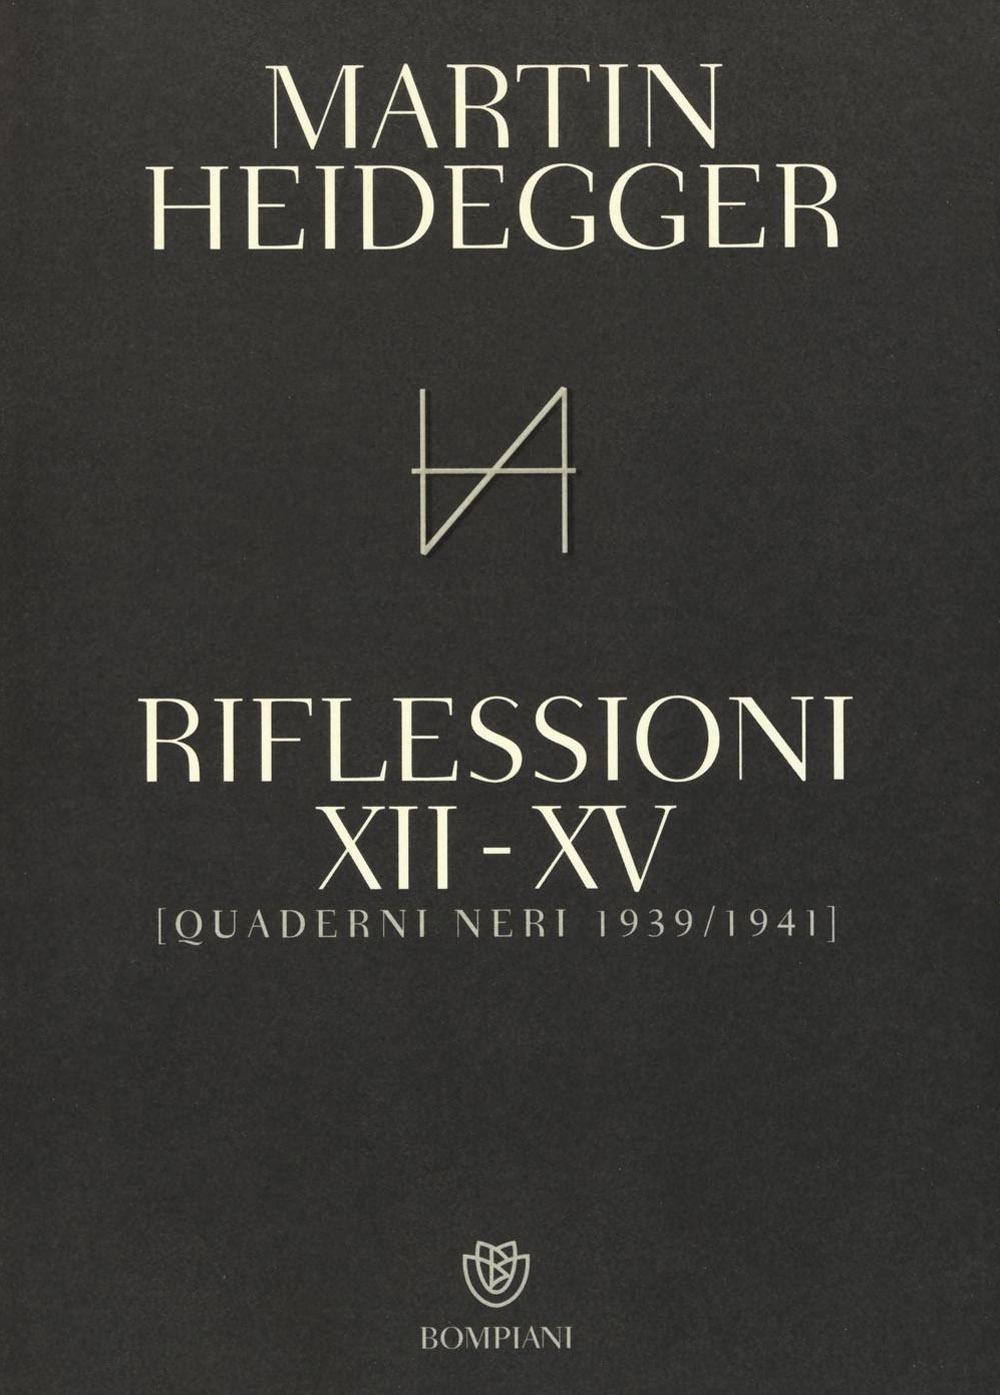 Quaderni neri 1939-1941. Riflessioni XII-XV